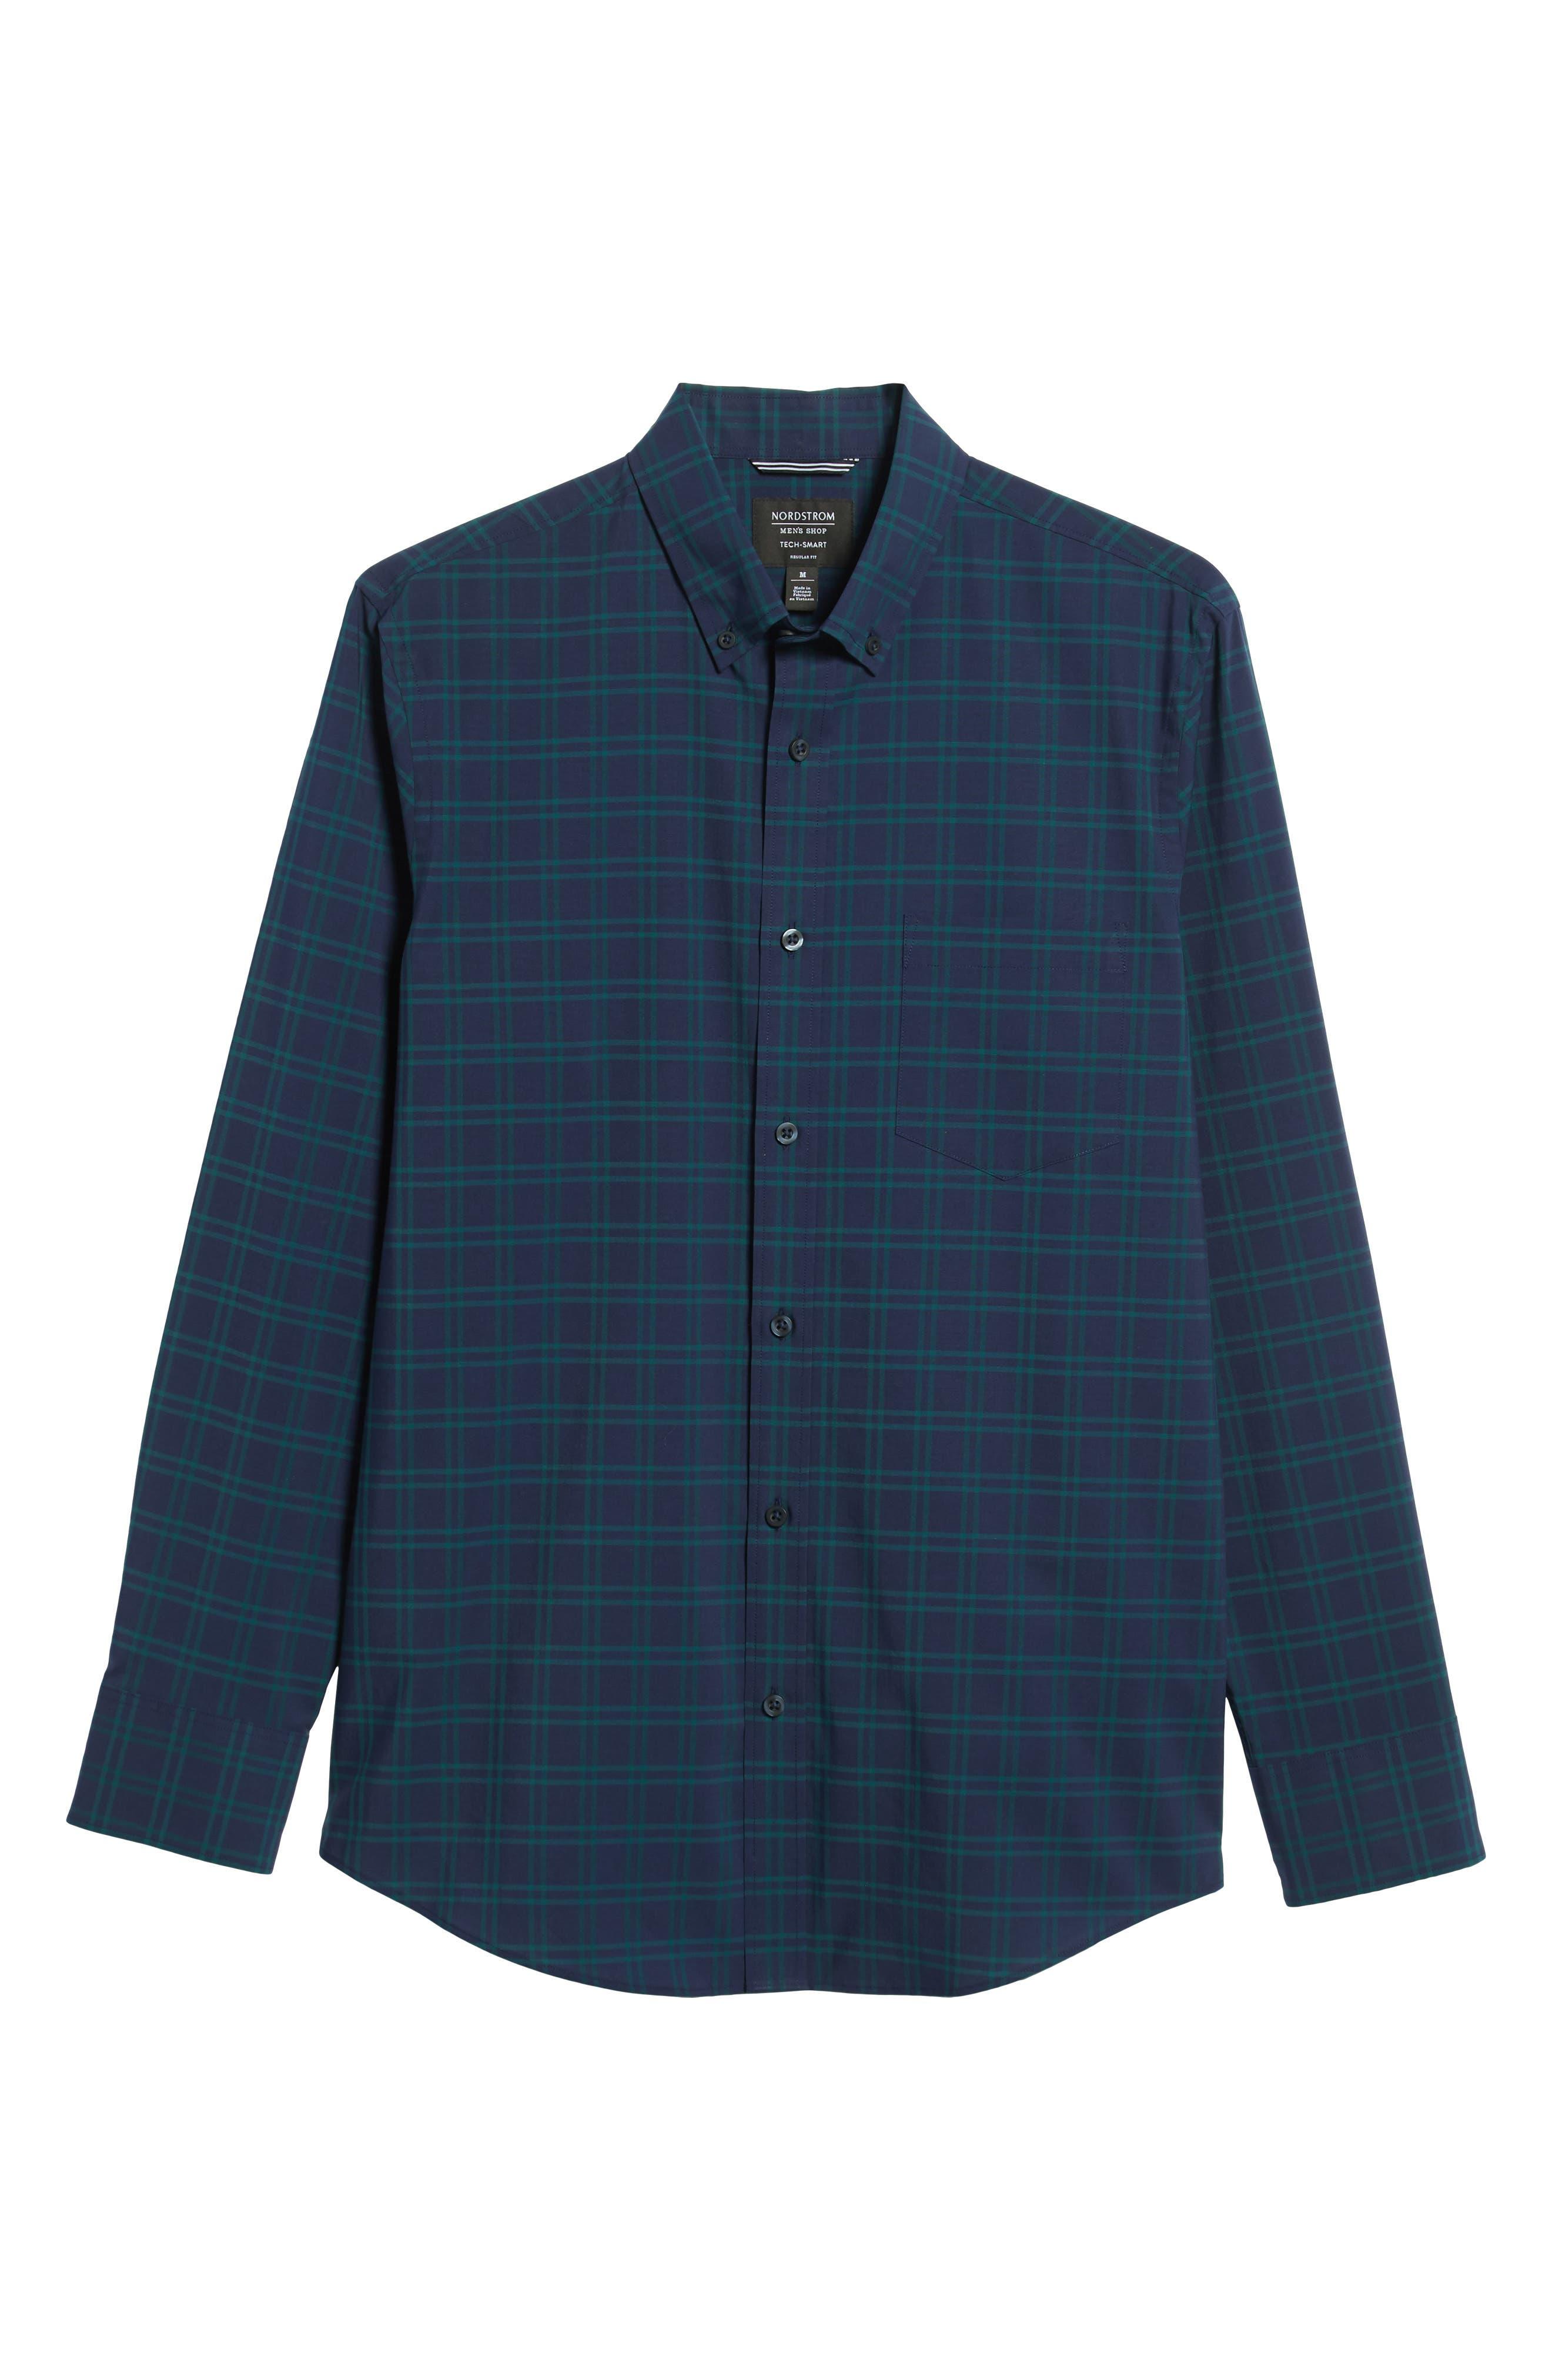 NORDSTROM MEN'S SHOP,                             Tech-Smart Slim Fit Check Sport Shirt,                             Alternate thumbnail 5, color,                             NAVY IRIS TEAL WINDOWPANE